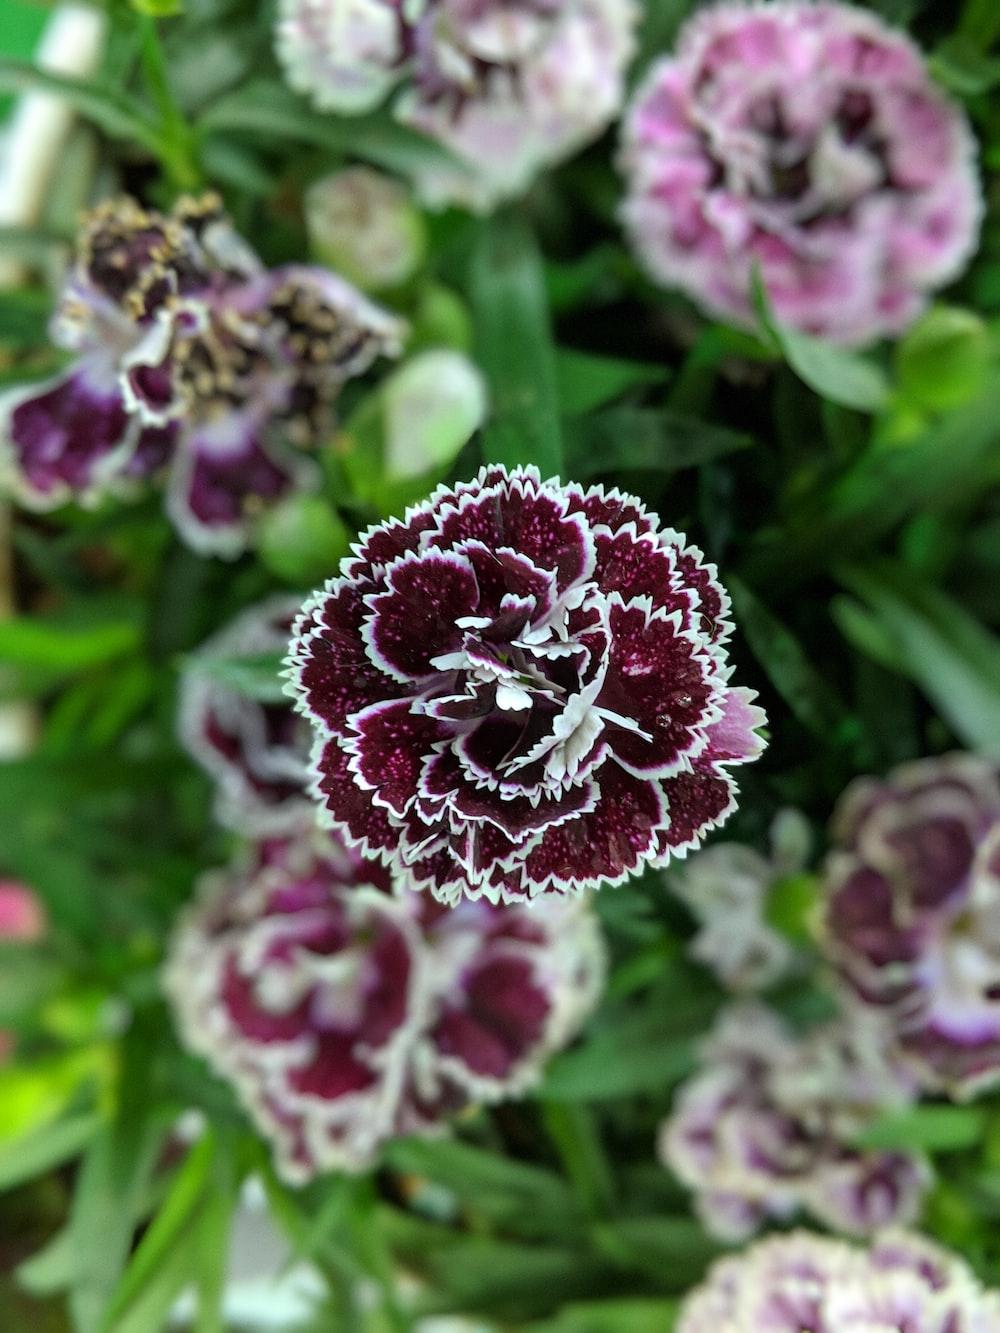 closeup photo of maroon flower